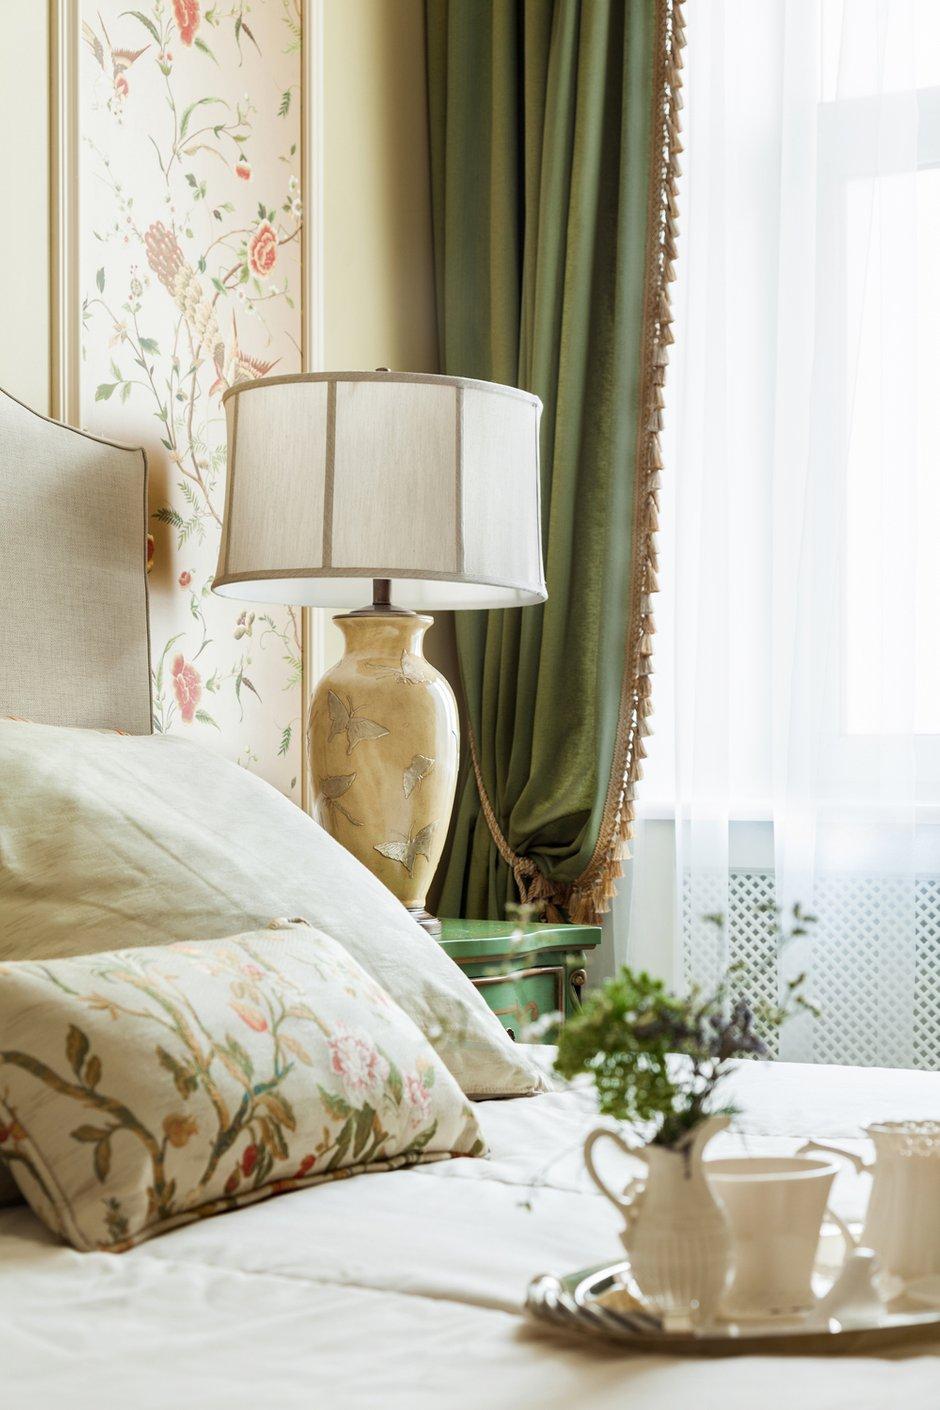 Фотография: Спальня в стиле Прованс и Кантри, Классический, Квартира, Дома и квартиры, IKEA, Проект недели, Сталинка – фото на INMYROOM